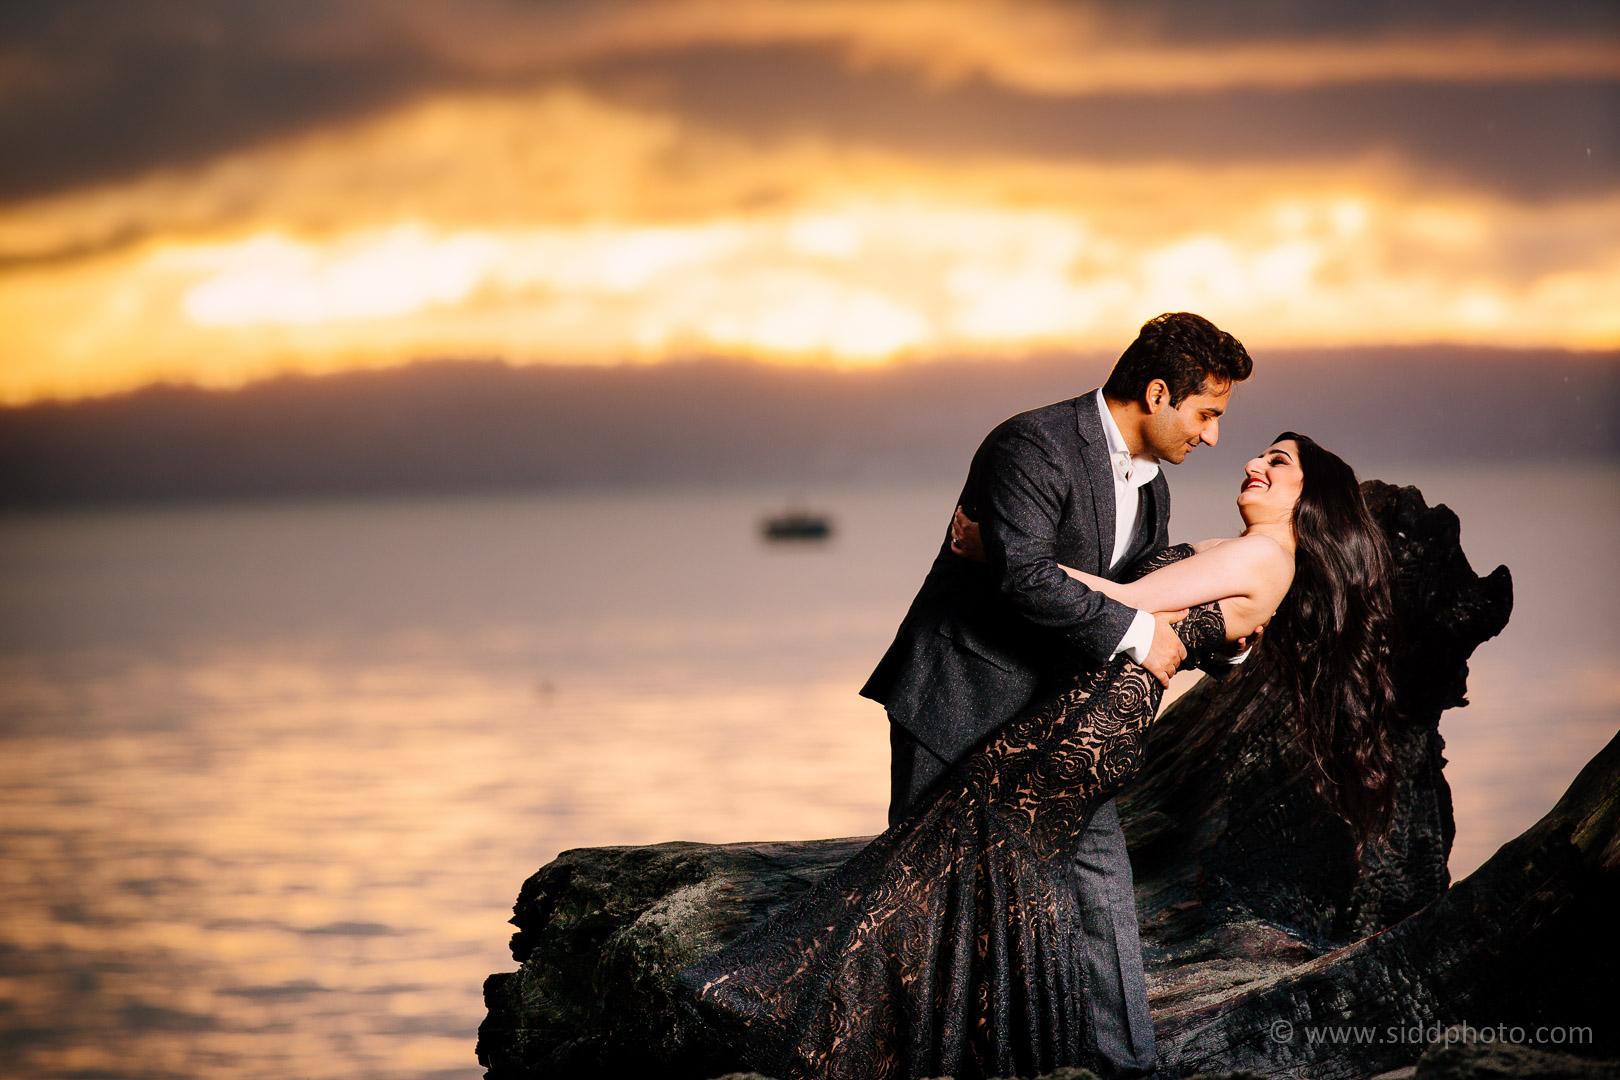 2014-12-28 - Sumedha Prateek Photoshoot - _O5C0882